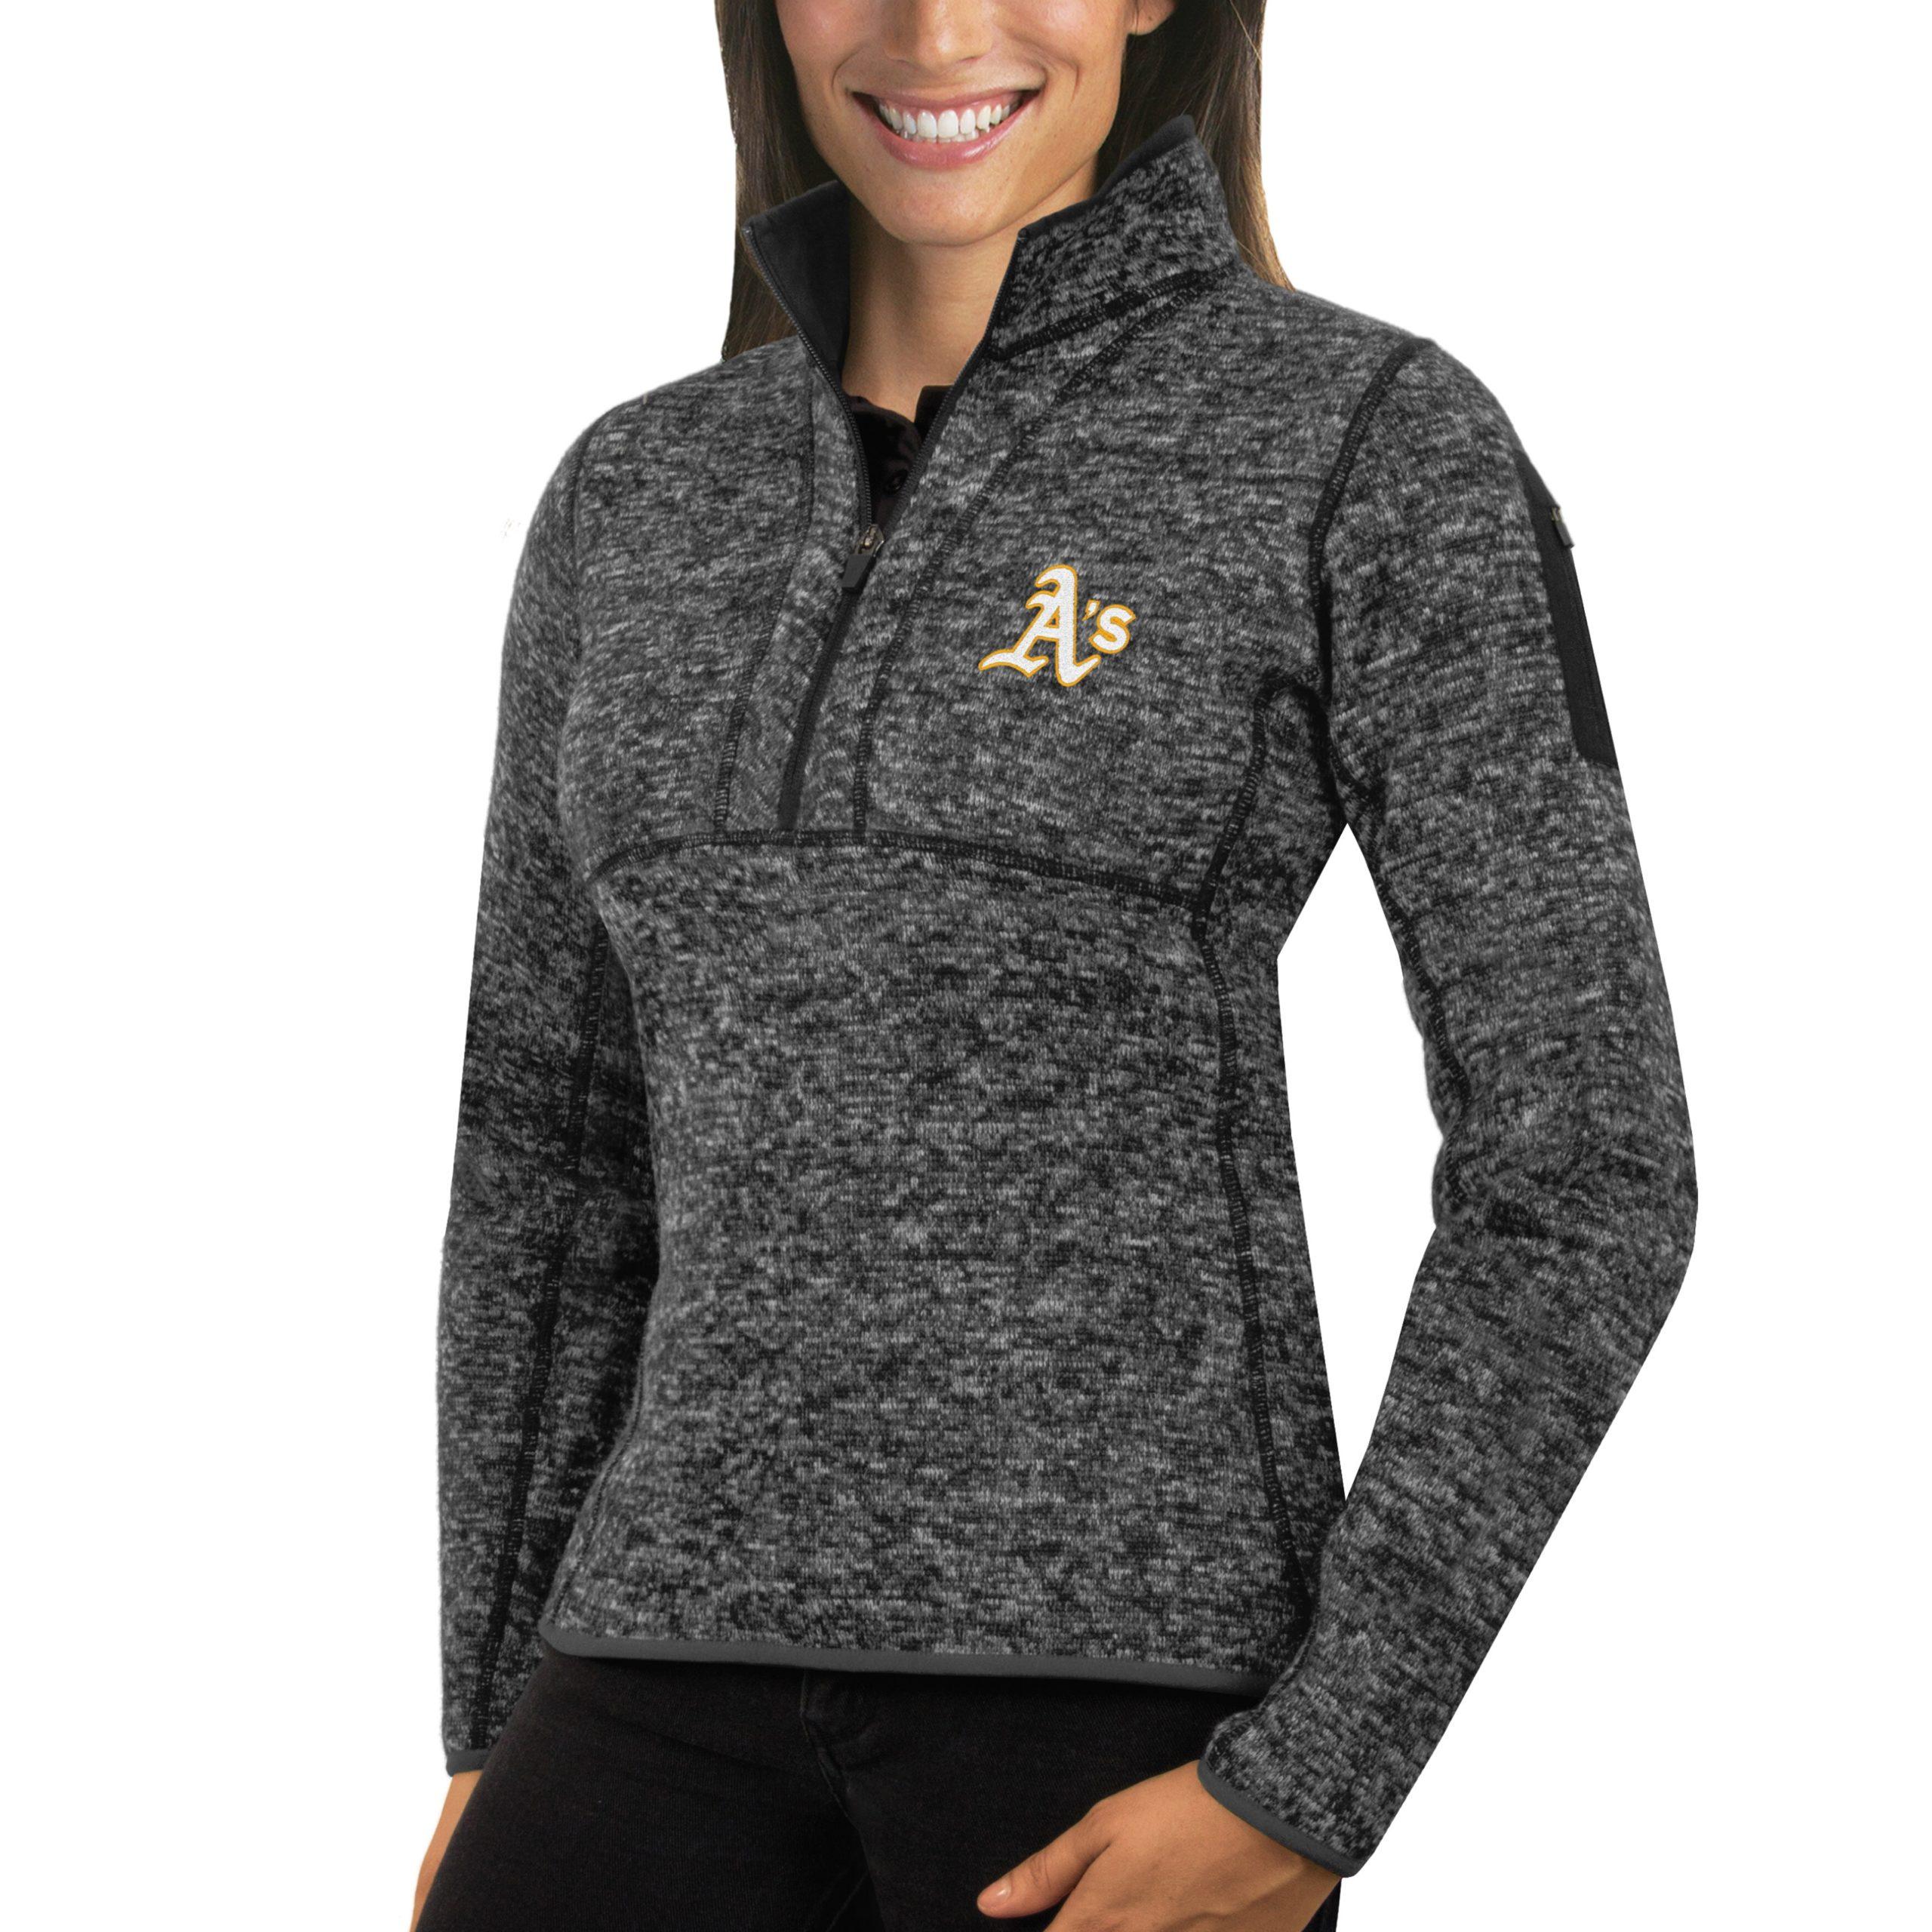 Oakland Athletics Antigua Women's Fortune Half-Zip Pullover Sweater - Heathered Charcoal